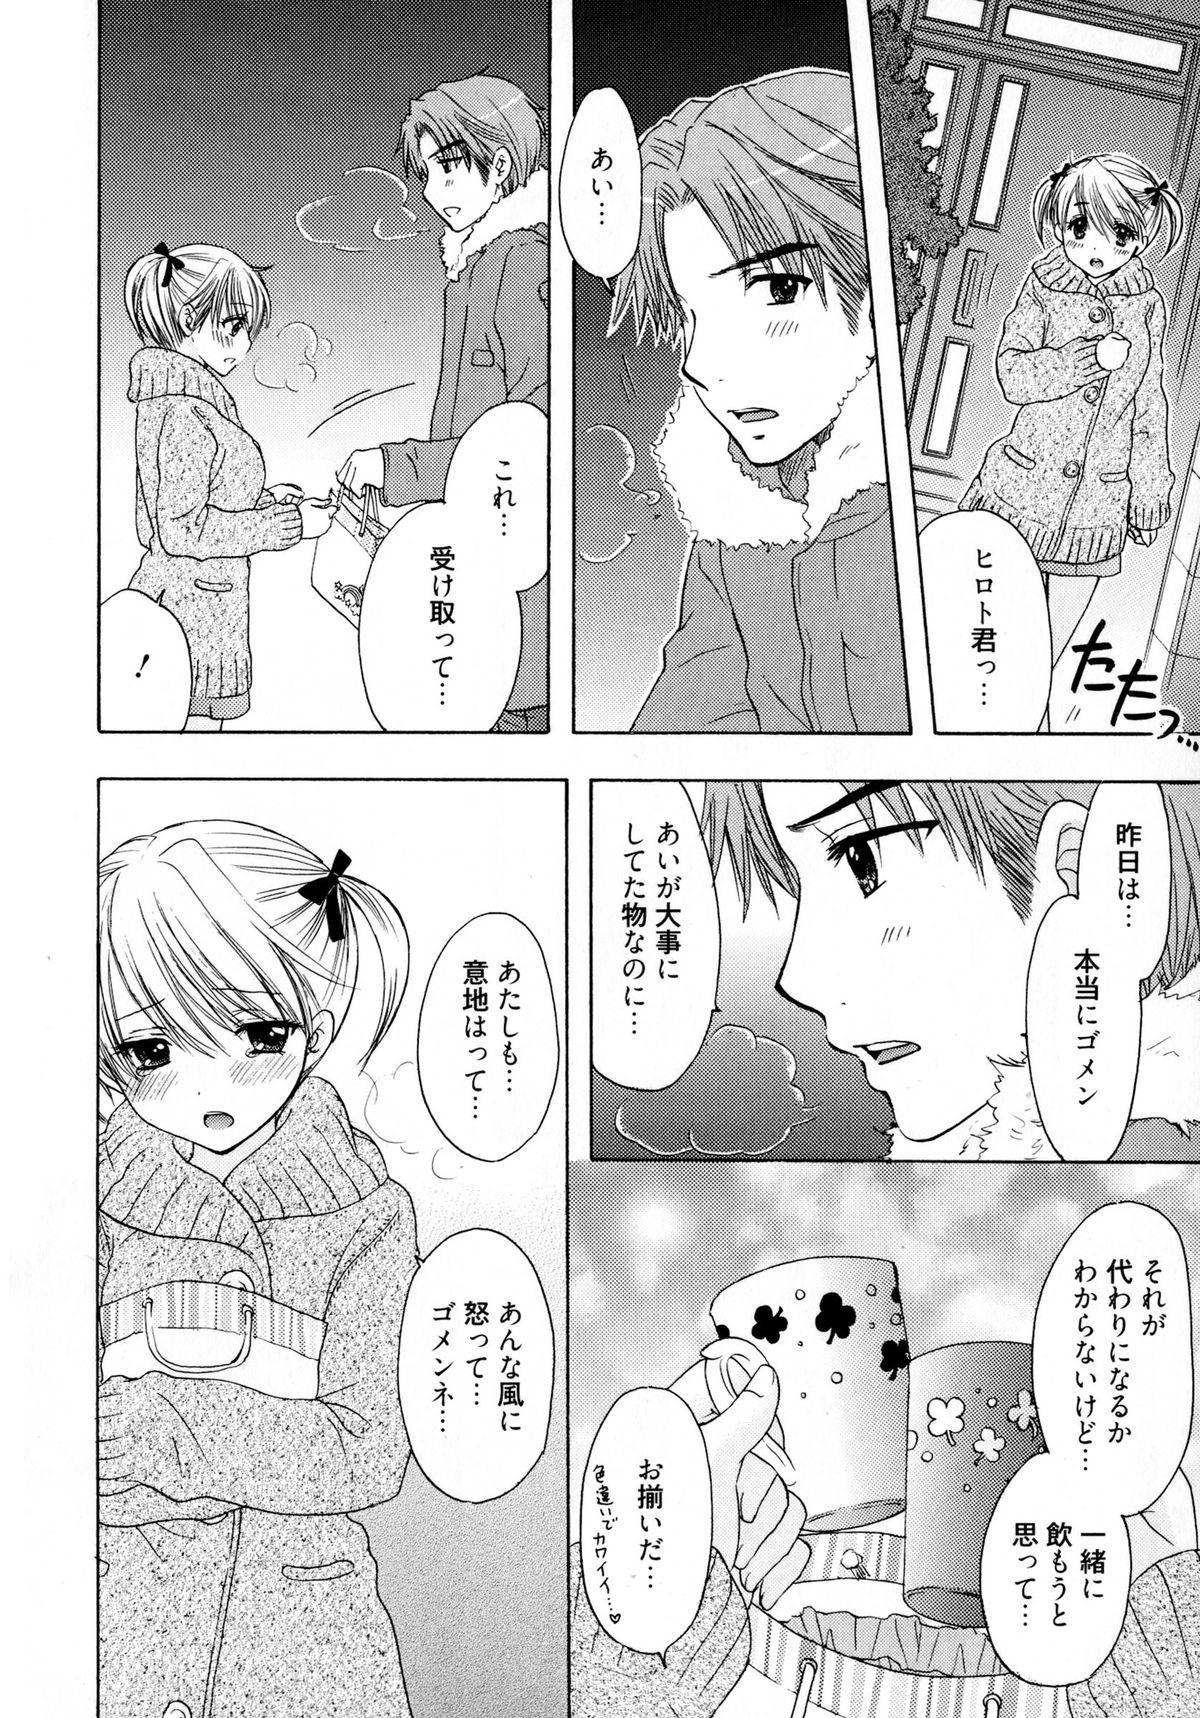 The Great Escape 4 Shokai Genteiban 95